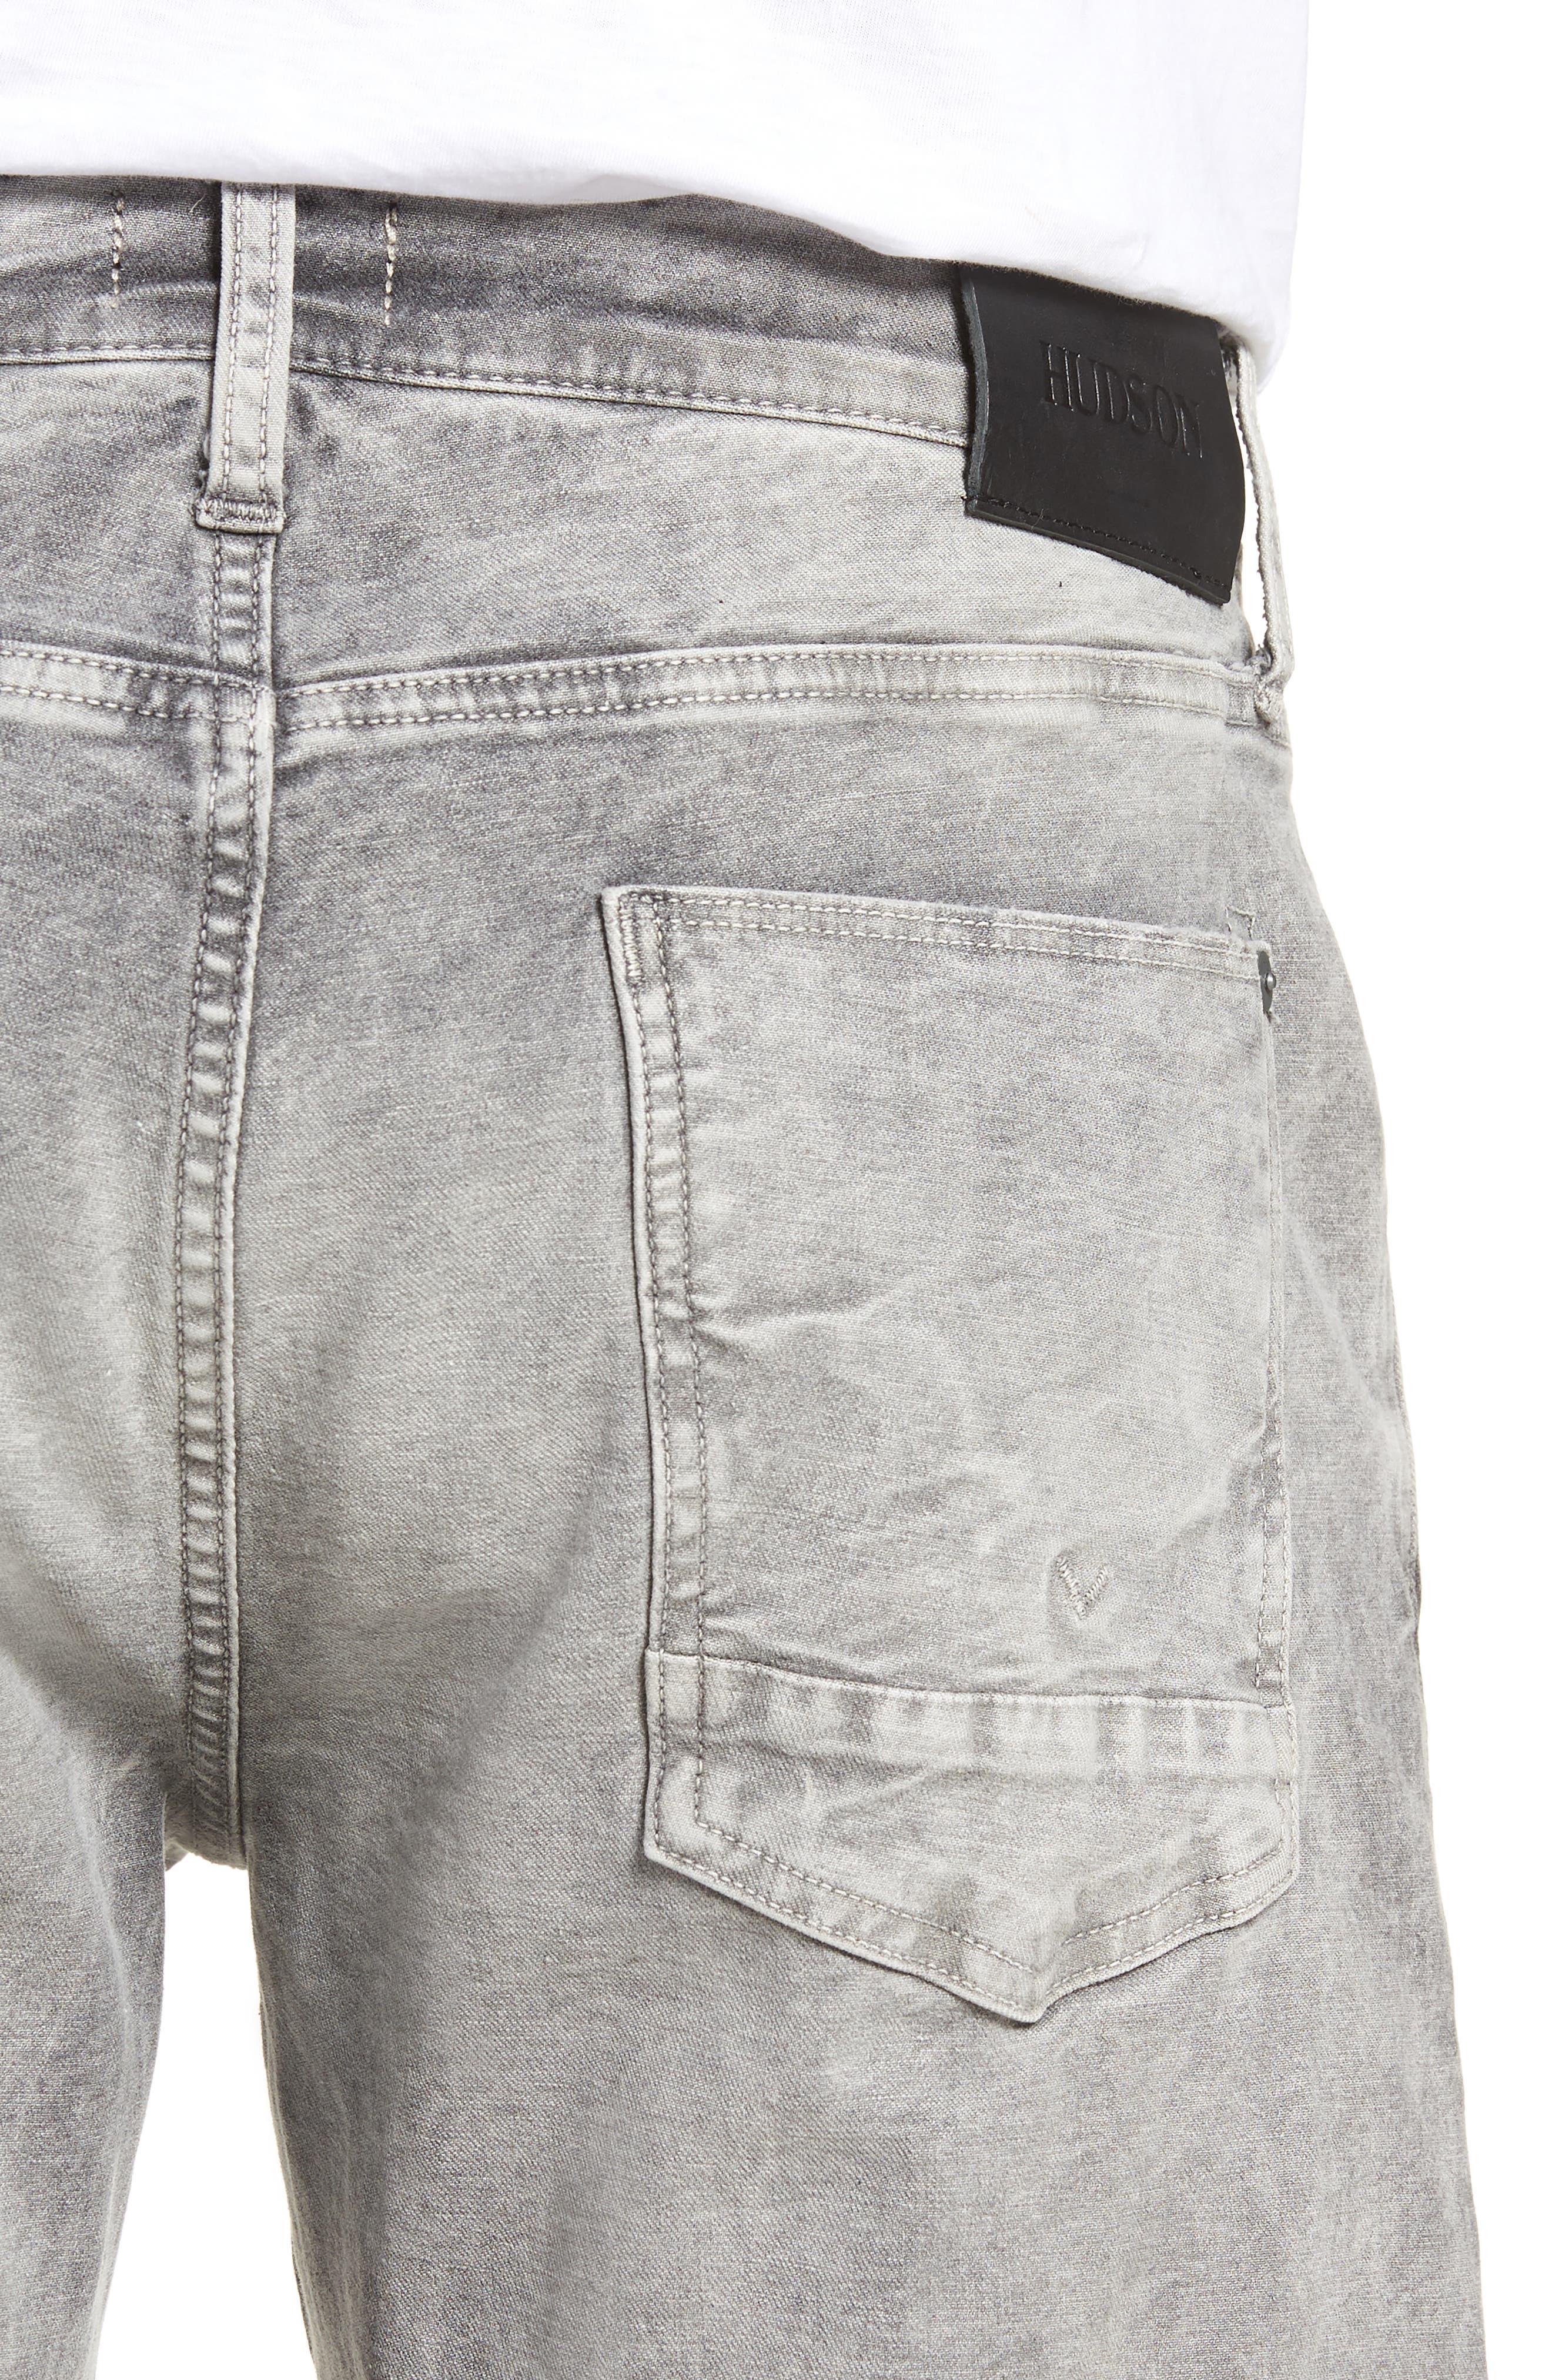 Blake Slim Fit Jeans,                             Alternate thumbnail 4, color,                             Deceiving